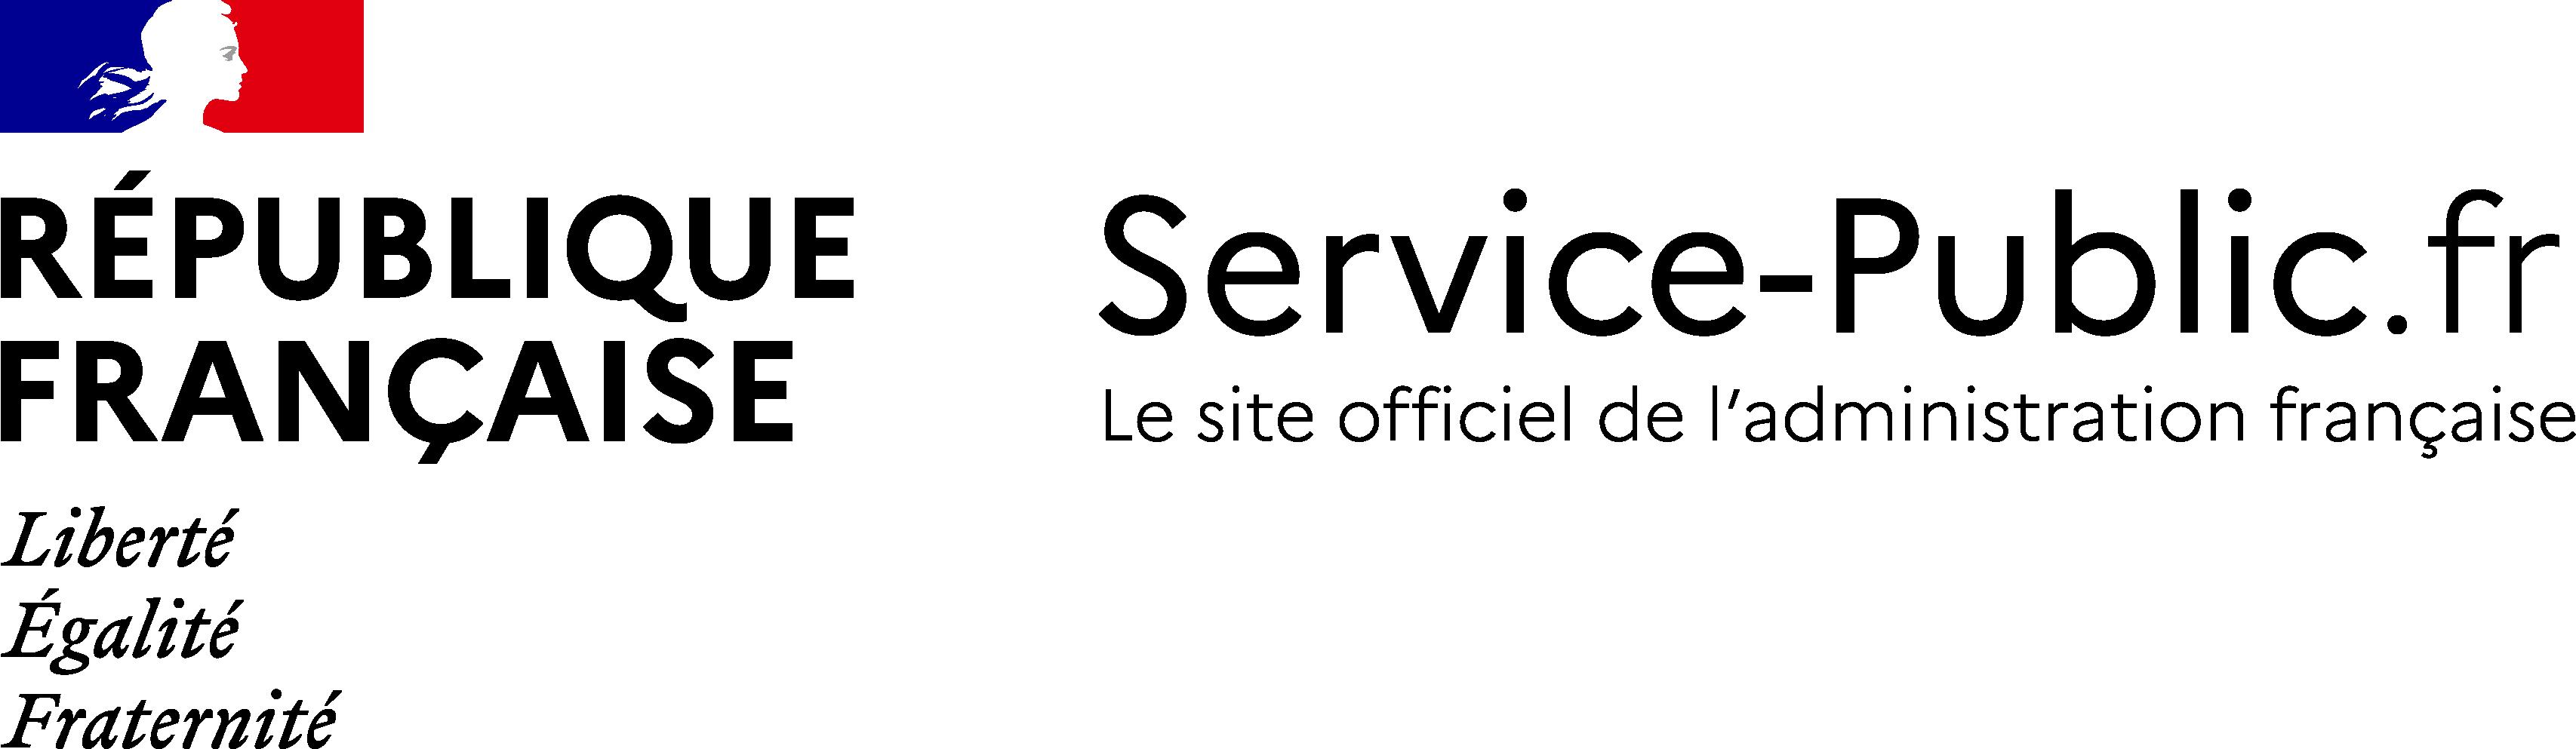 logoServicepublic.png